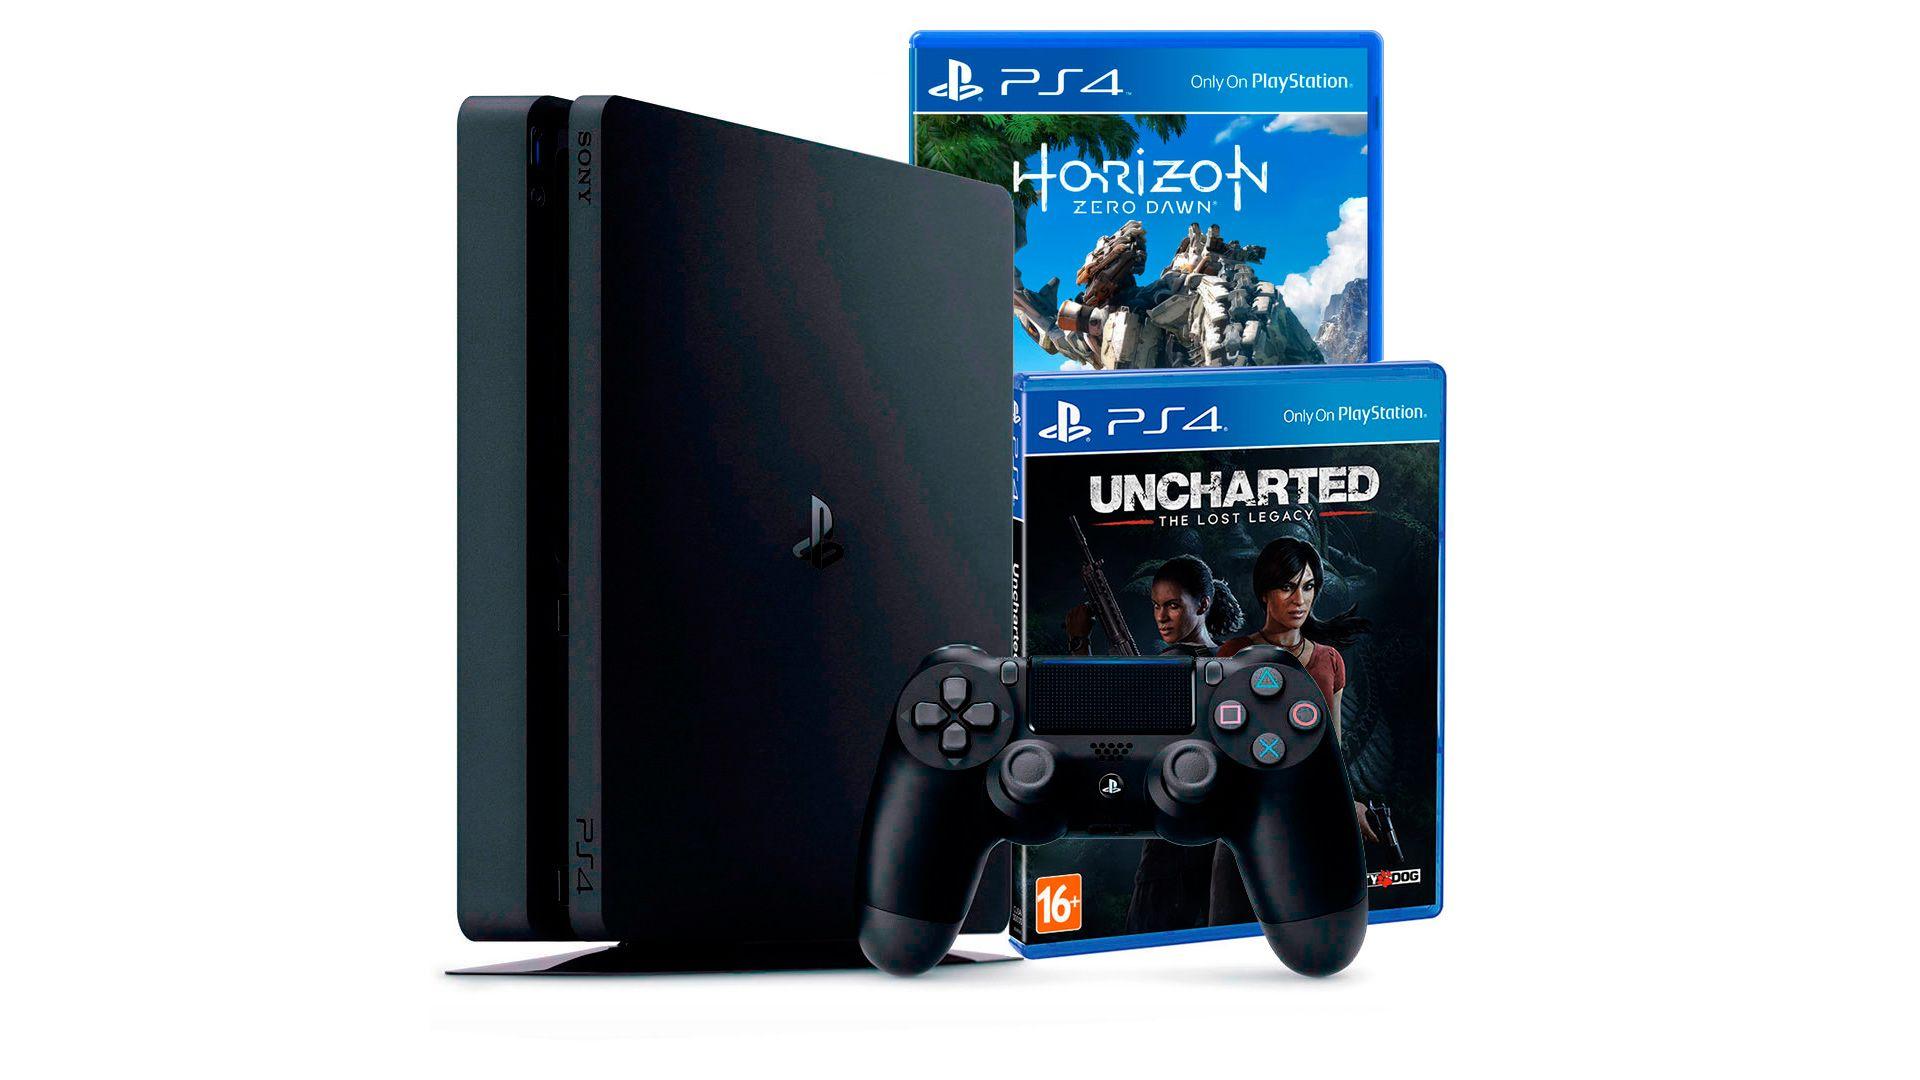 PlayStation 4 Slim 1Tb с играми Horizon Zero Dawn и Uncharted: Утраченное наследие [PS4S1HUZ]